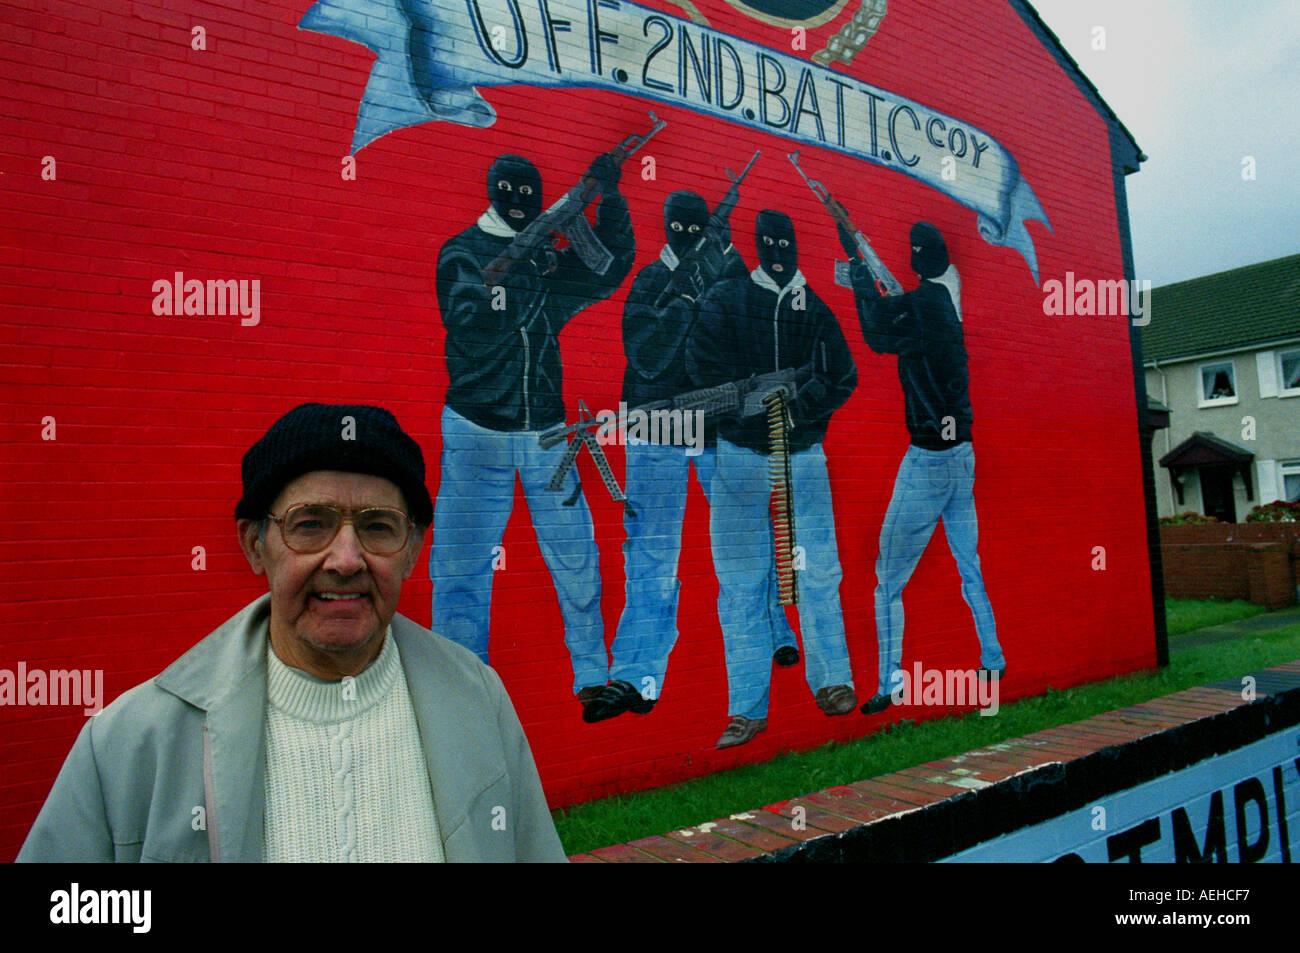 Shankill road mural,UFF - Stock Image